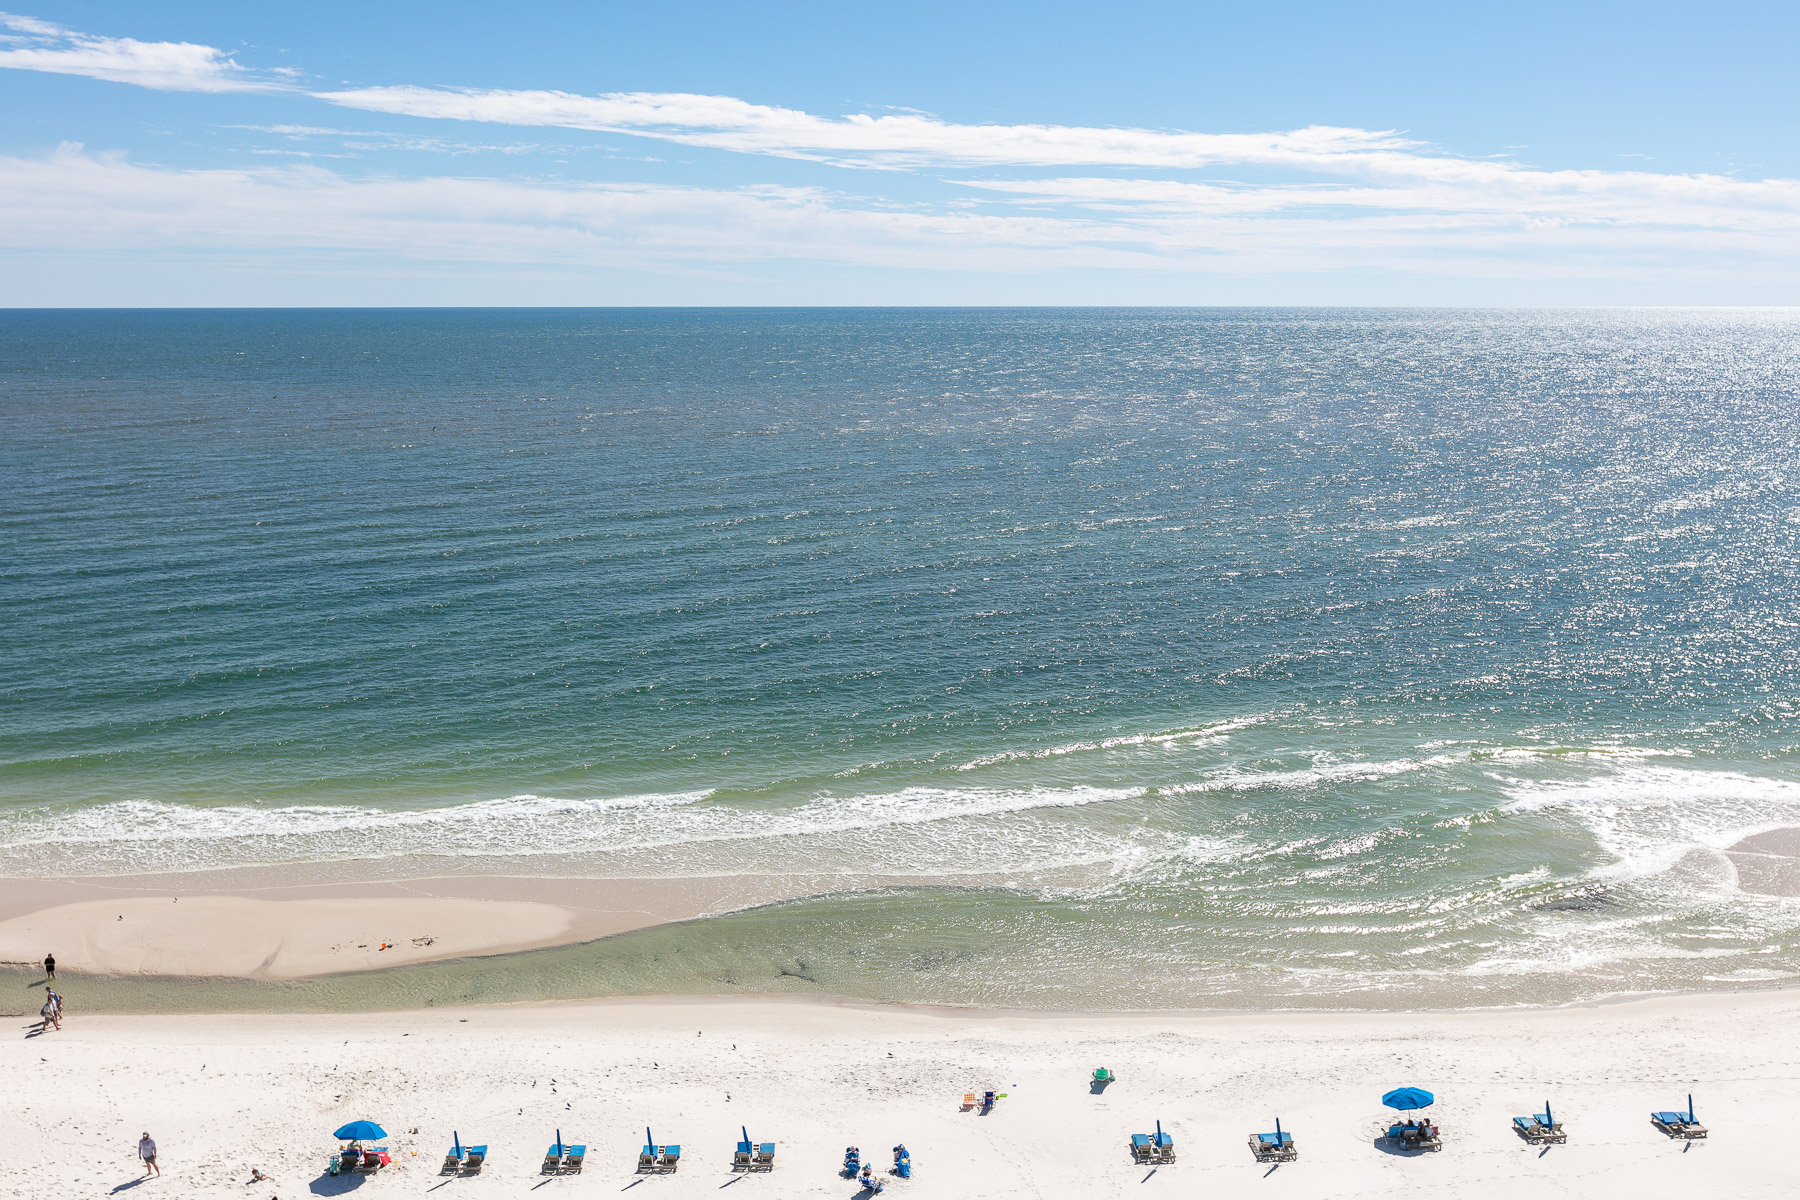 Views of the White Sandy Beach